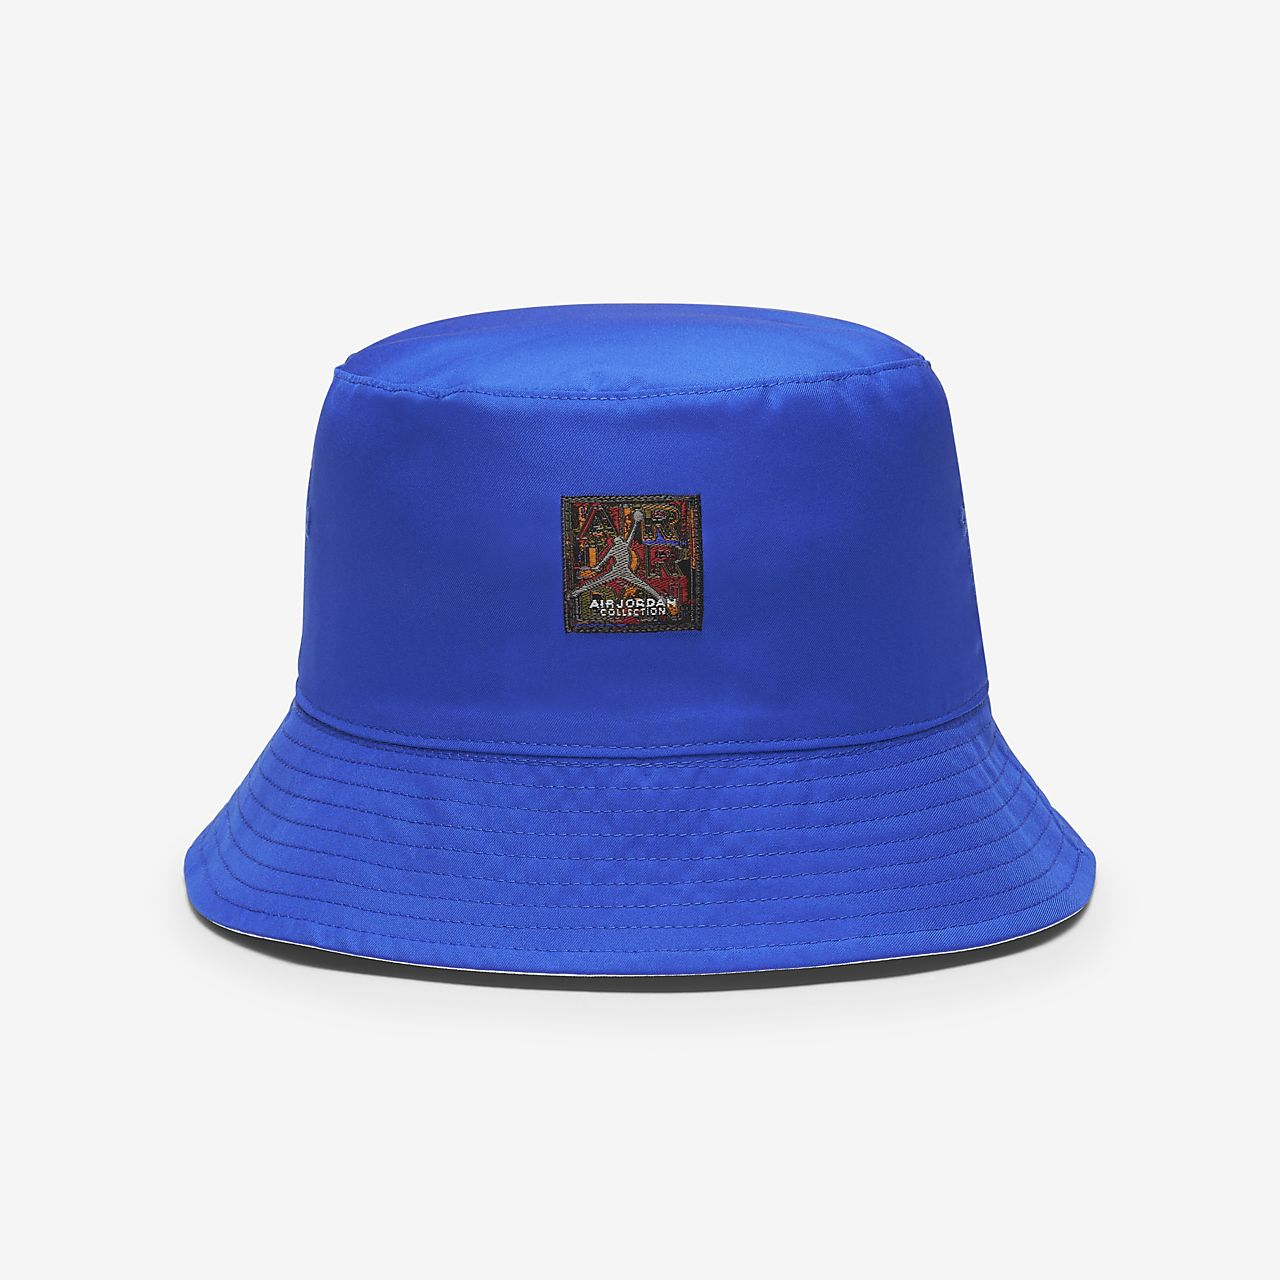 66374dee988 Jordan AJ 10 Accolades Bucket Hat. Nike.com